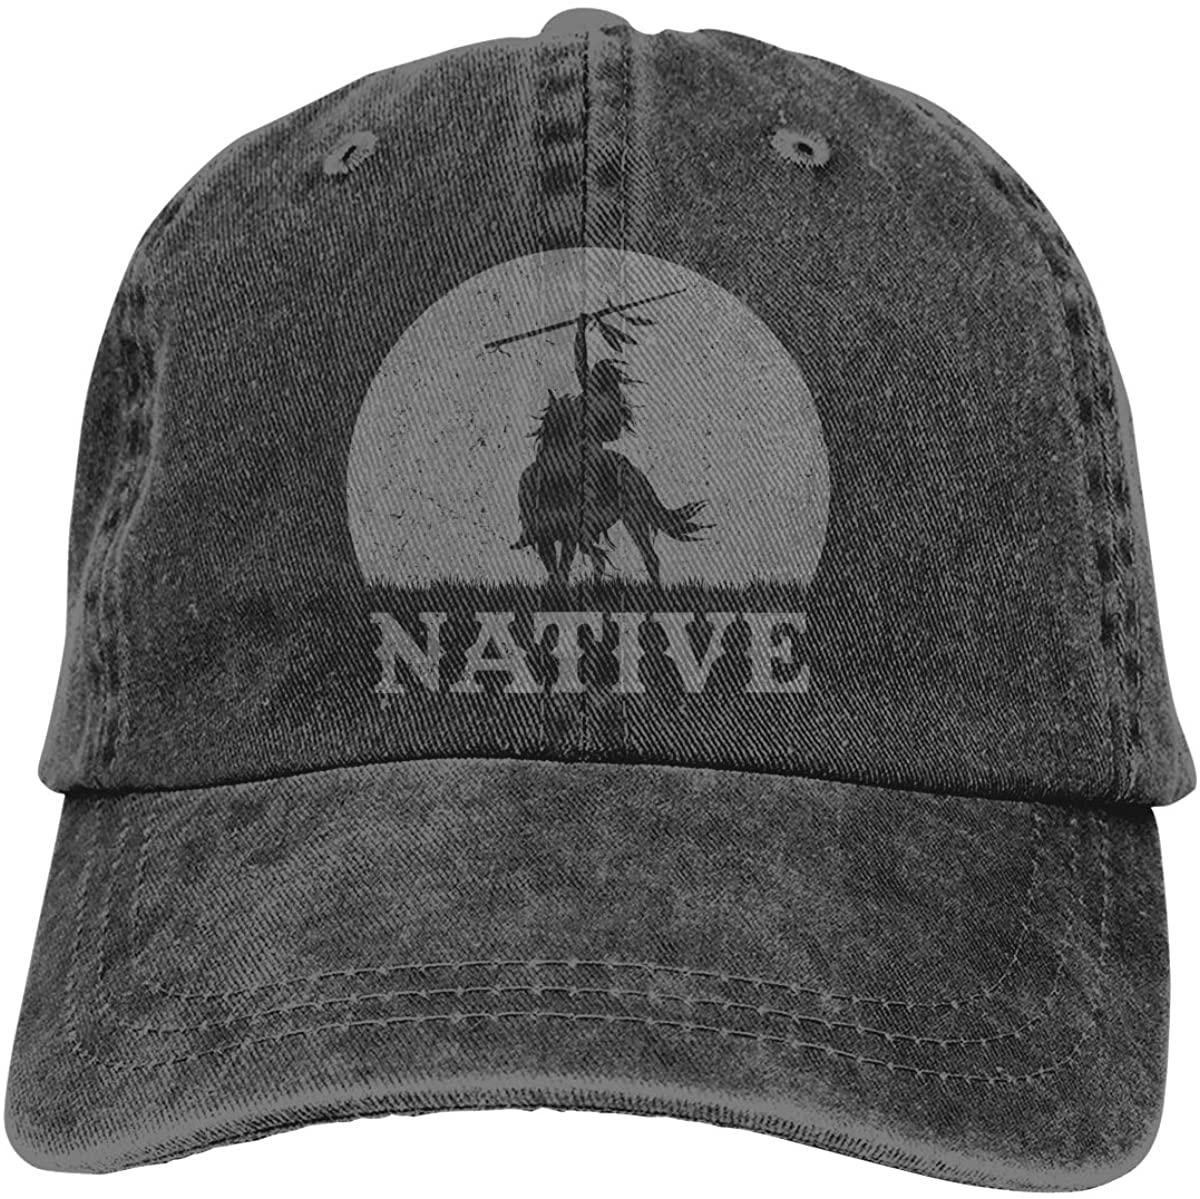 Native American Outdoor Sports Hat Adjustable Cowboy Hat